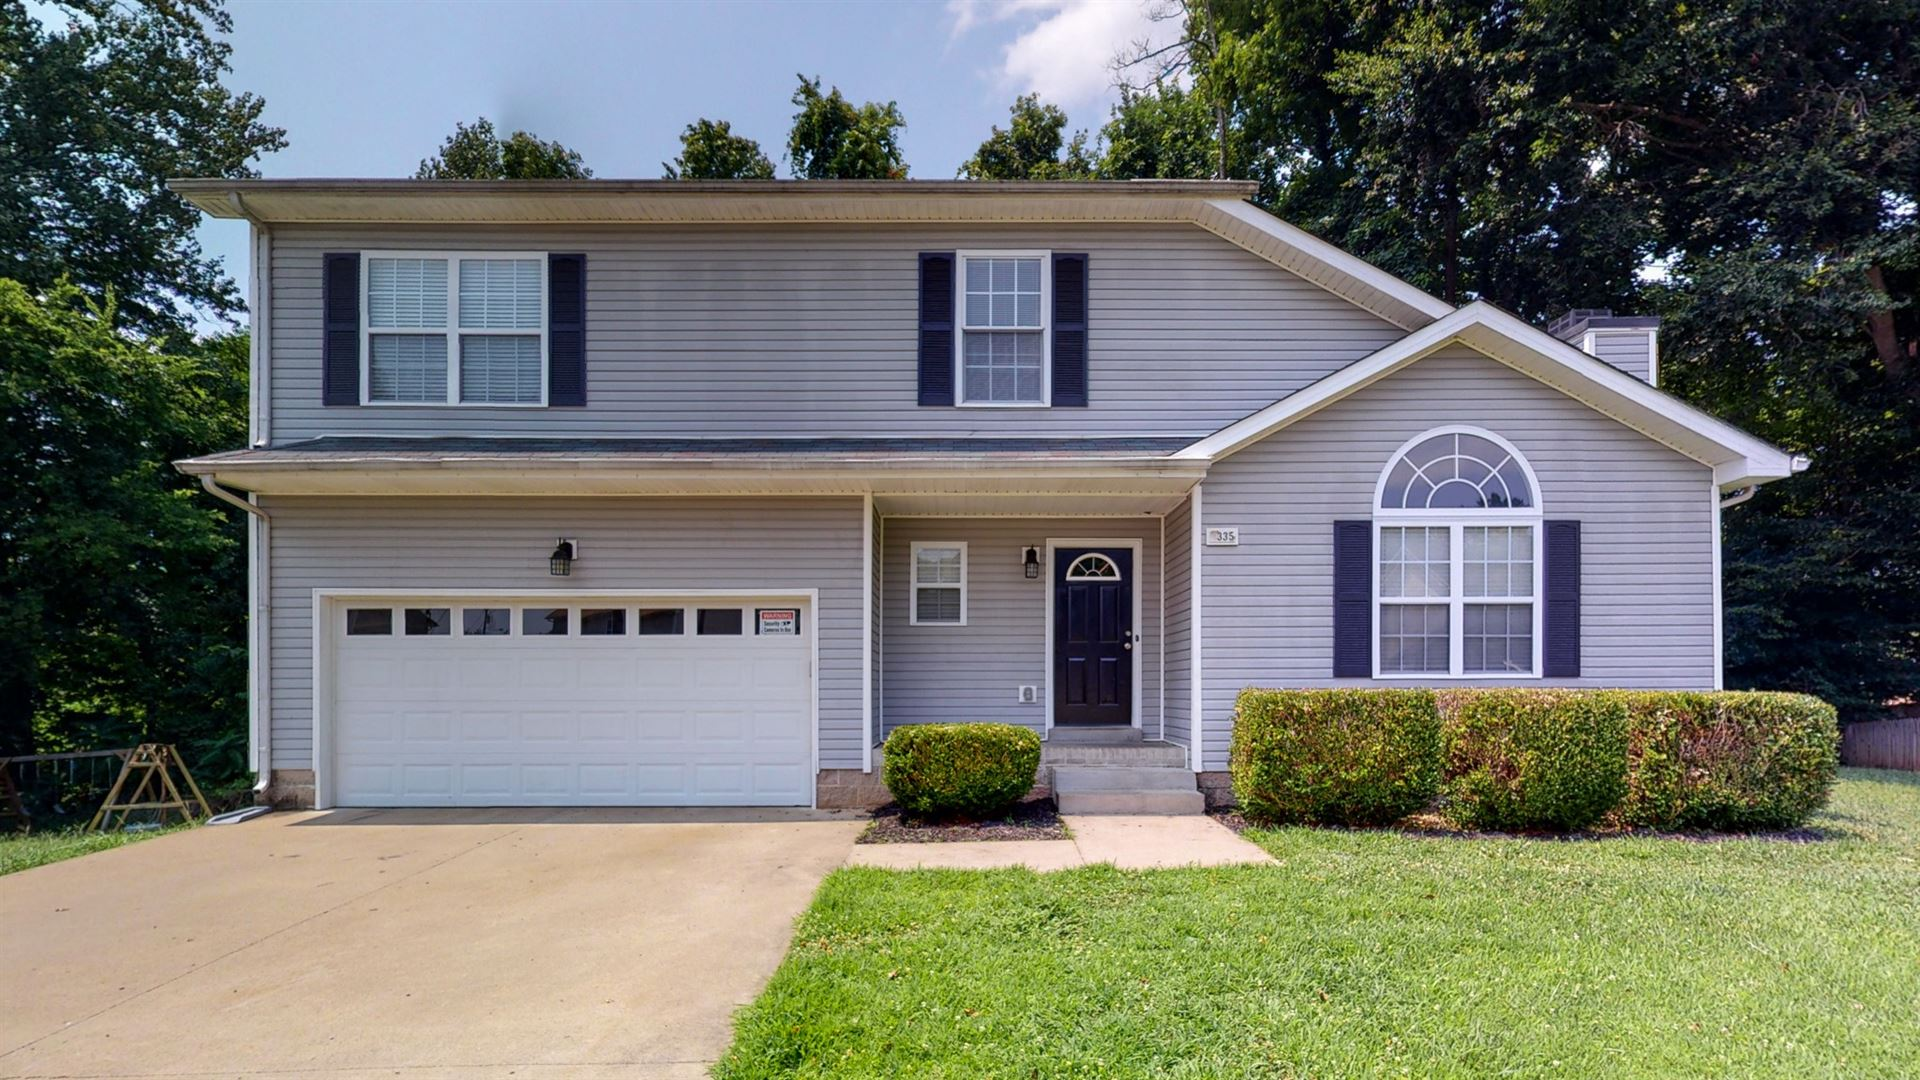 1335 Abigail Ct, Clarksville, TN 37042 - MLS#: 2274303